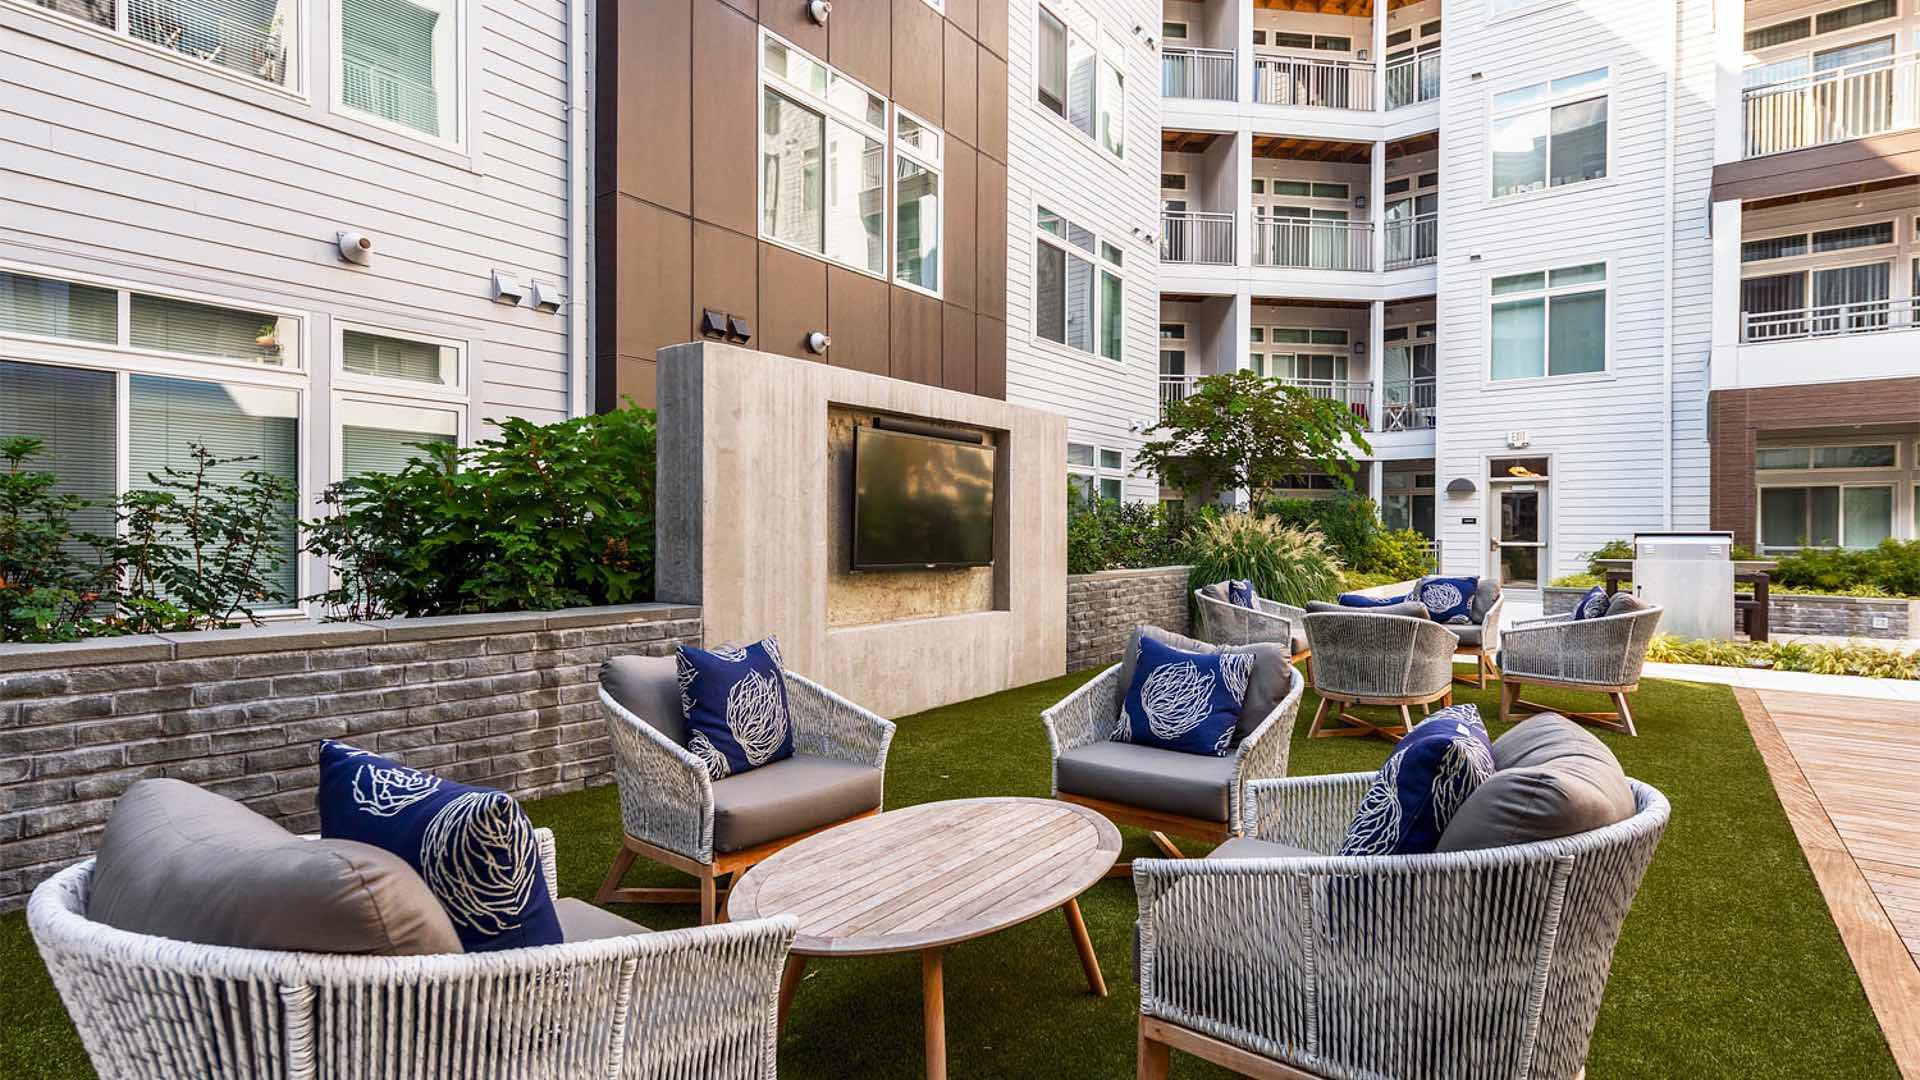 amenities Image 1